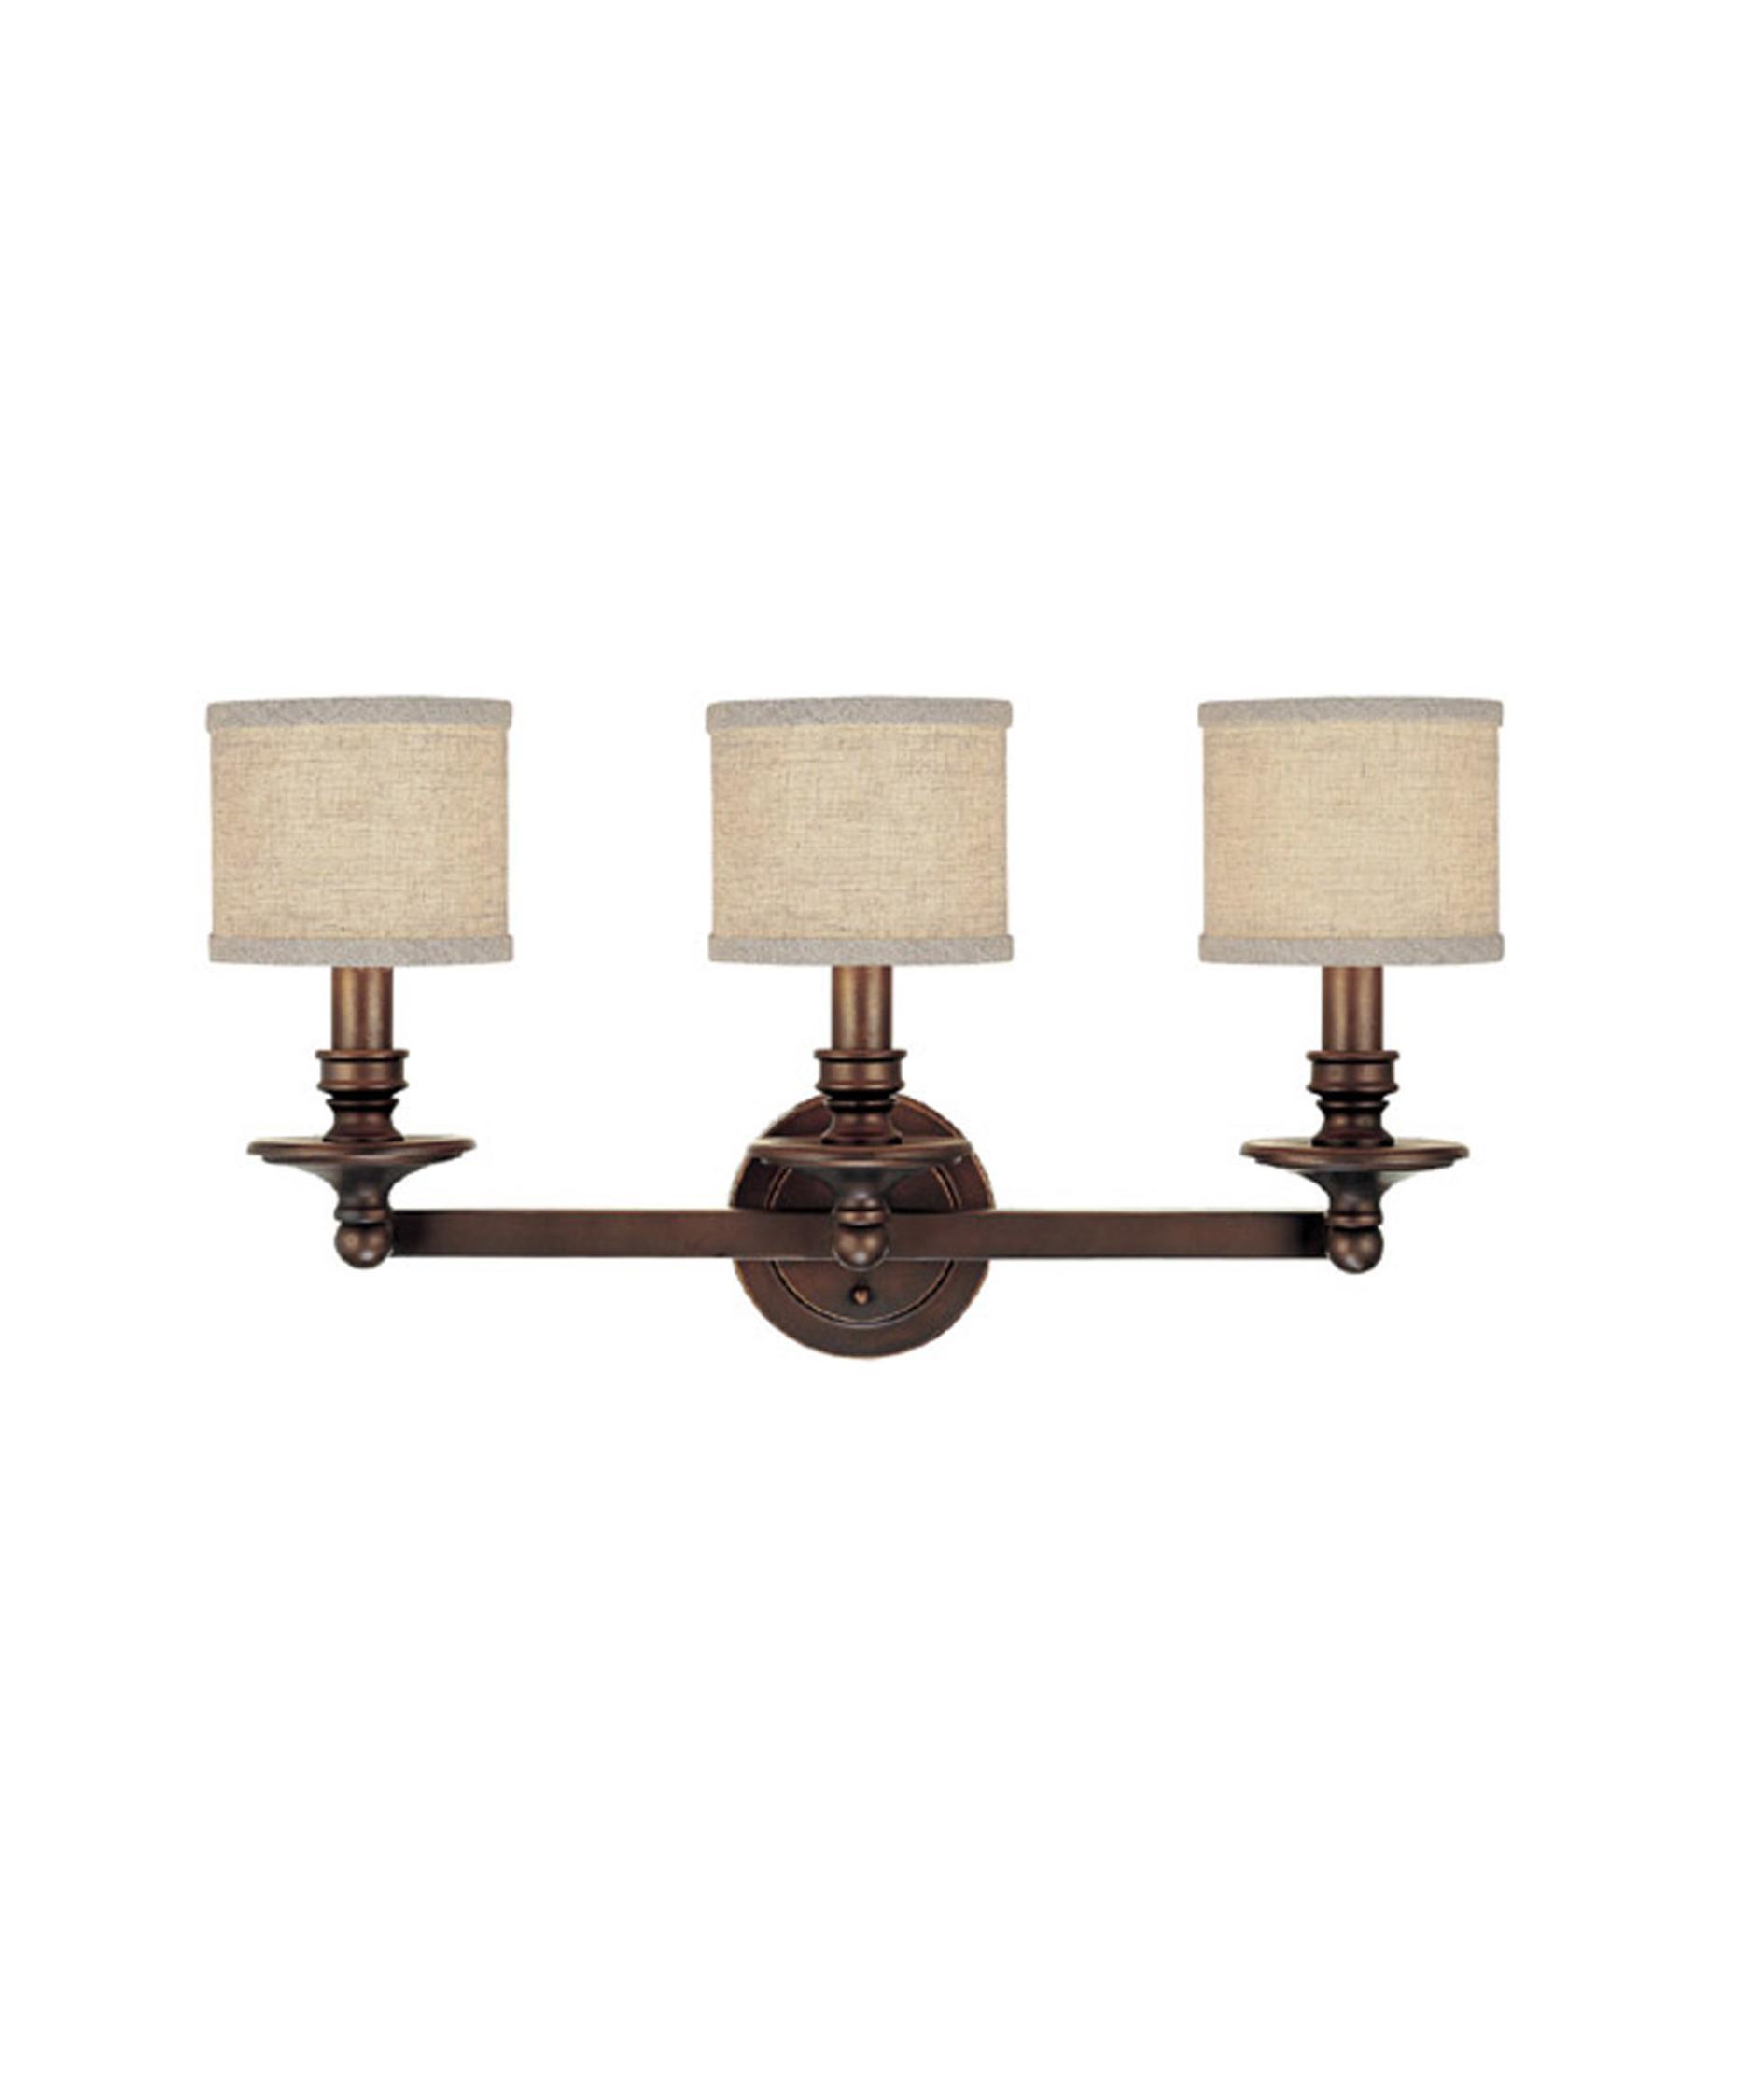 Bathroom Light Fixtures With Fabric Shades capital lighting 1238 midtown 26 inch wide bath vanity light